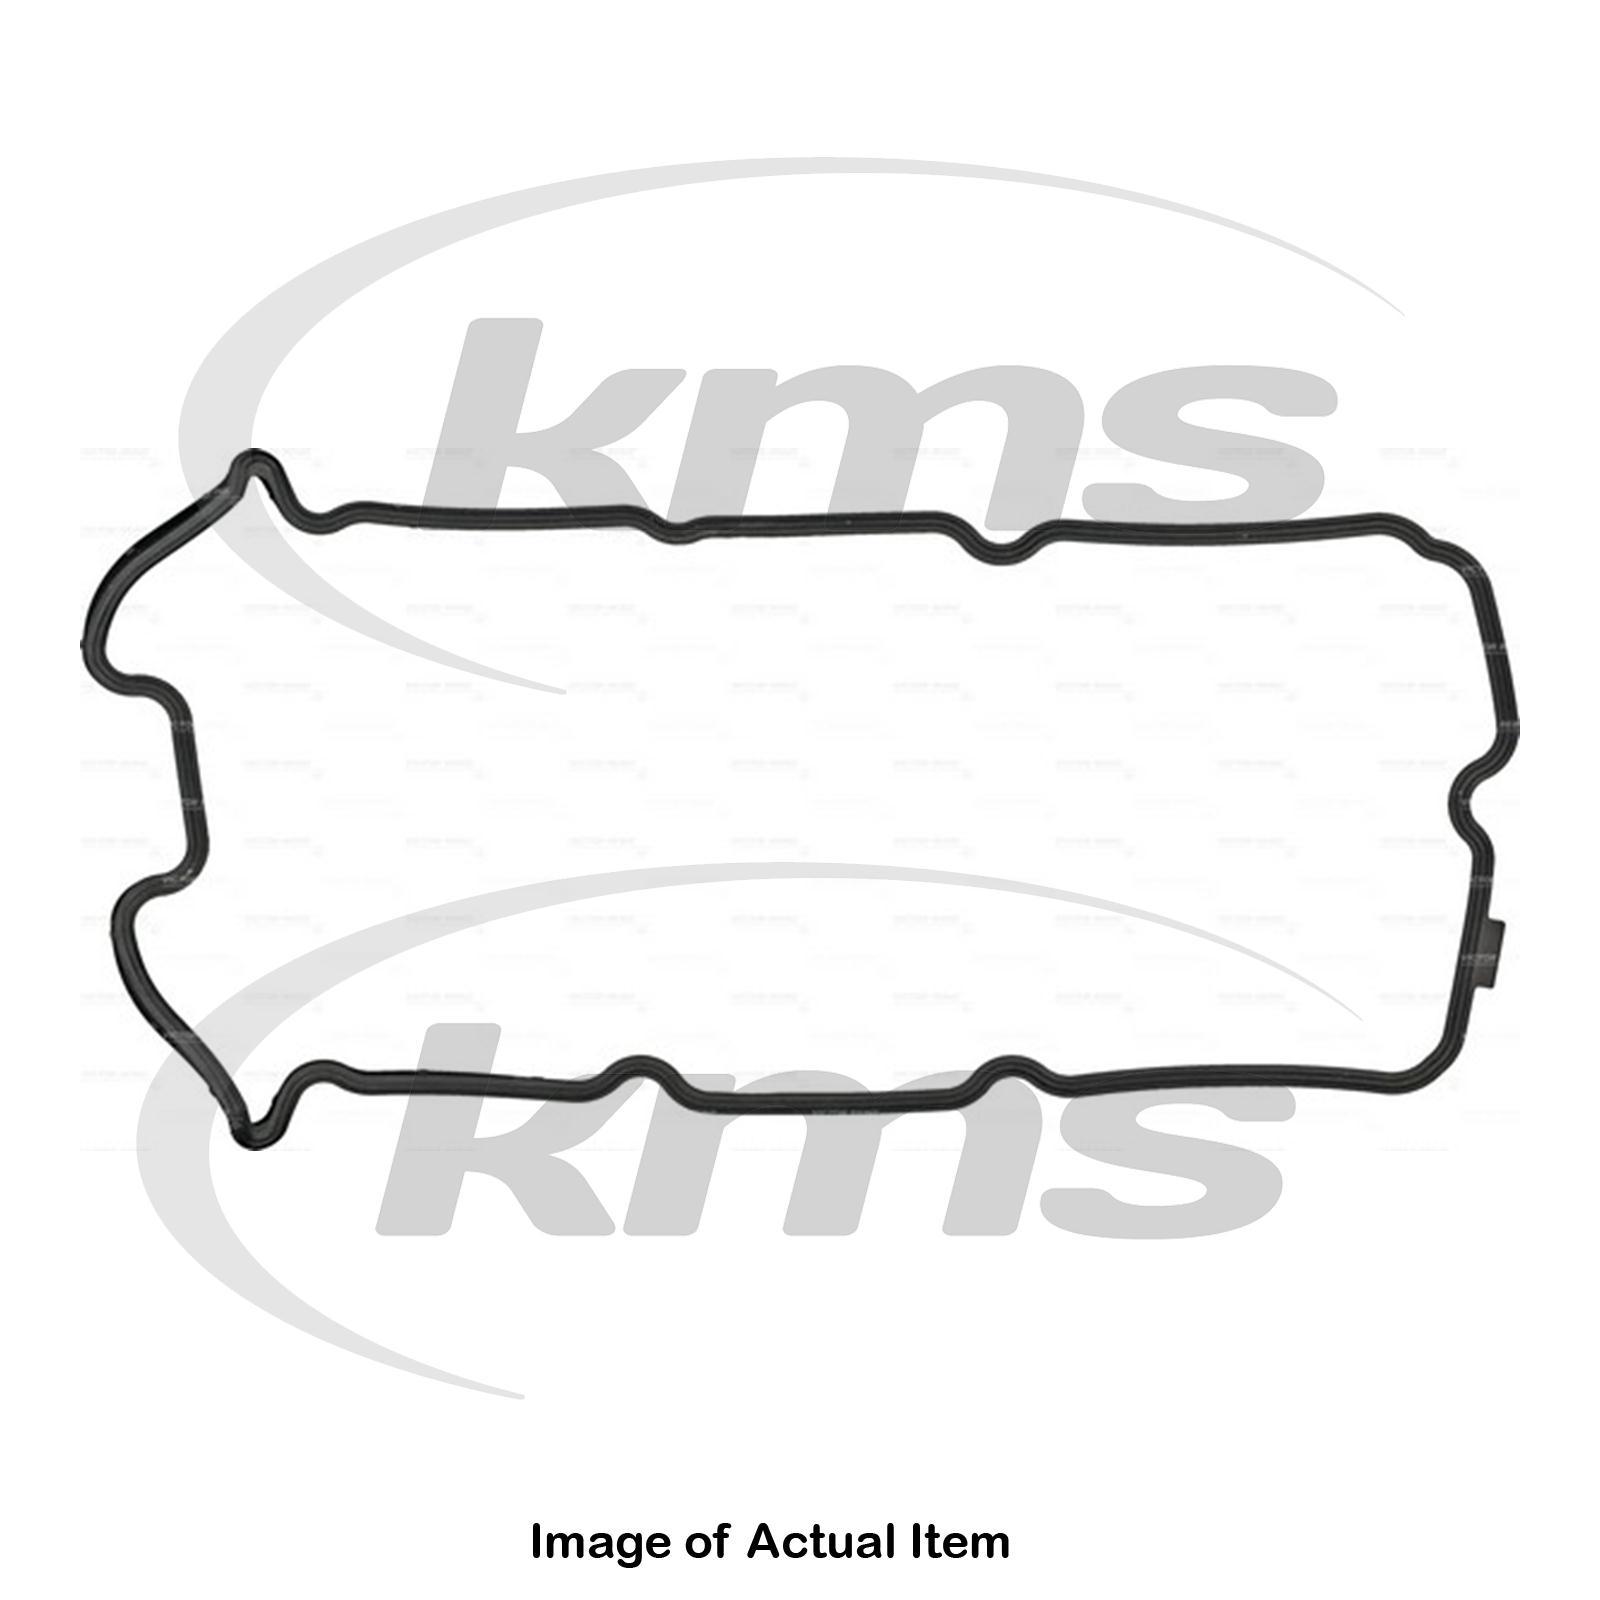 New Genuine Victor Reinz Cylinder Head Cover Seal Gasket